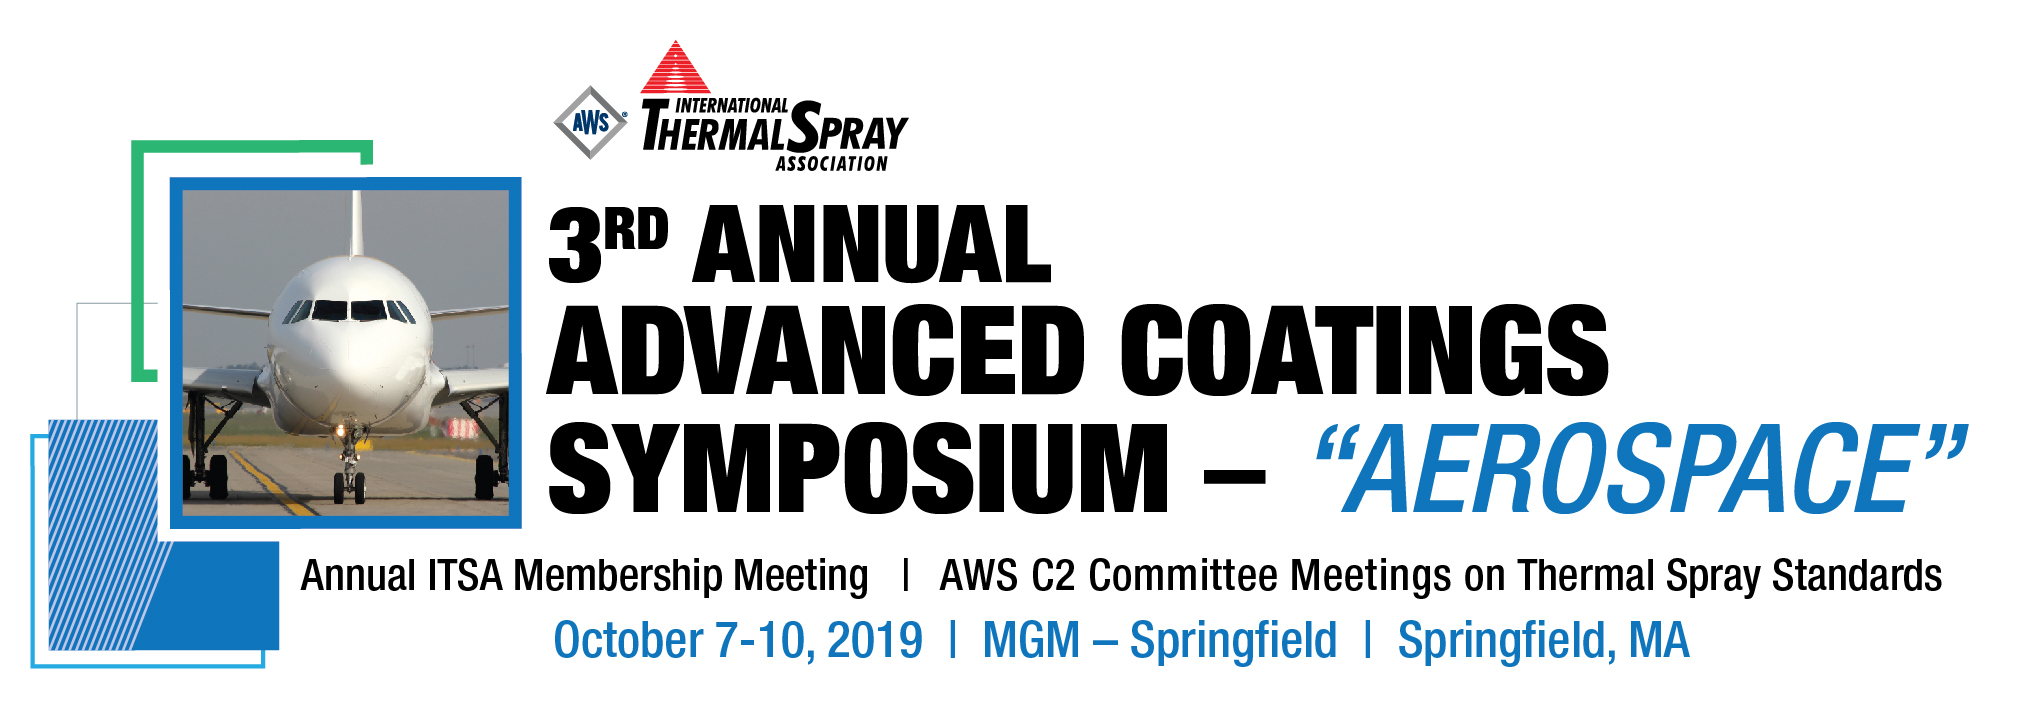 3rd Annual Advanced Coating Symposium